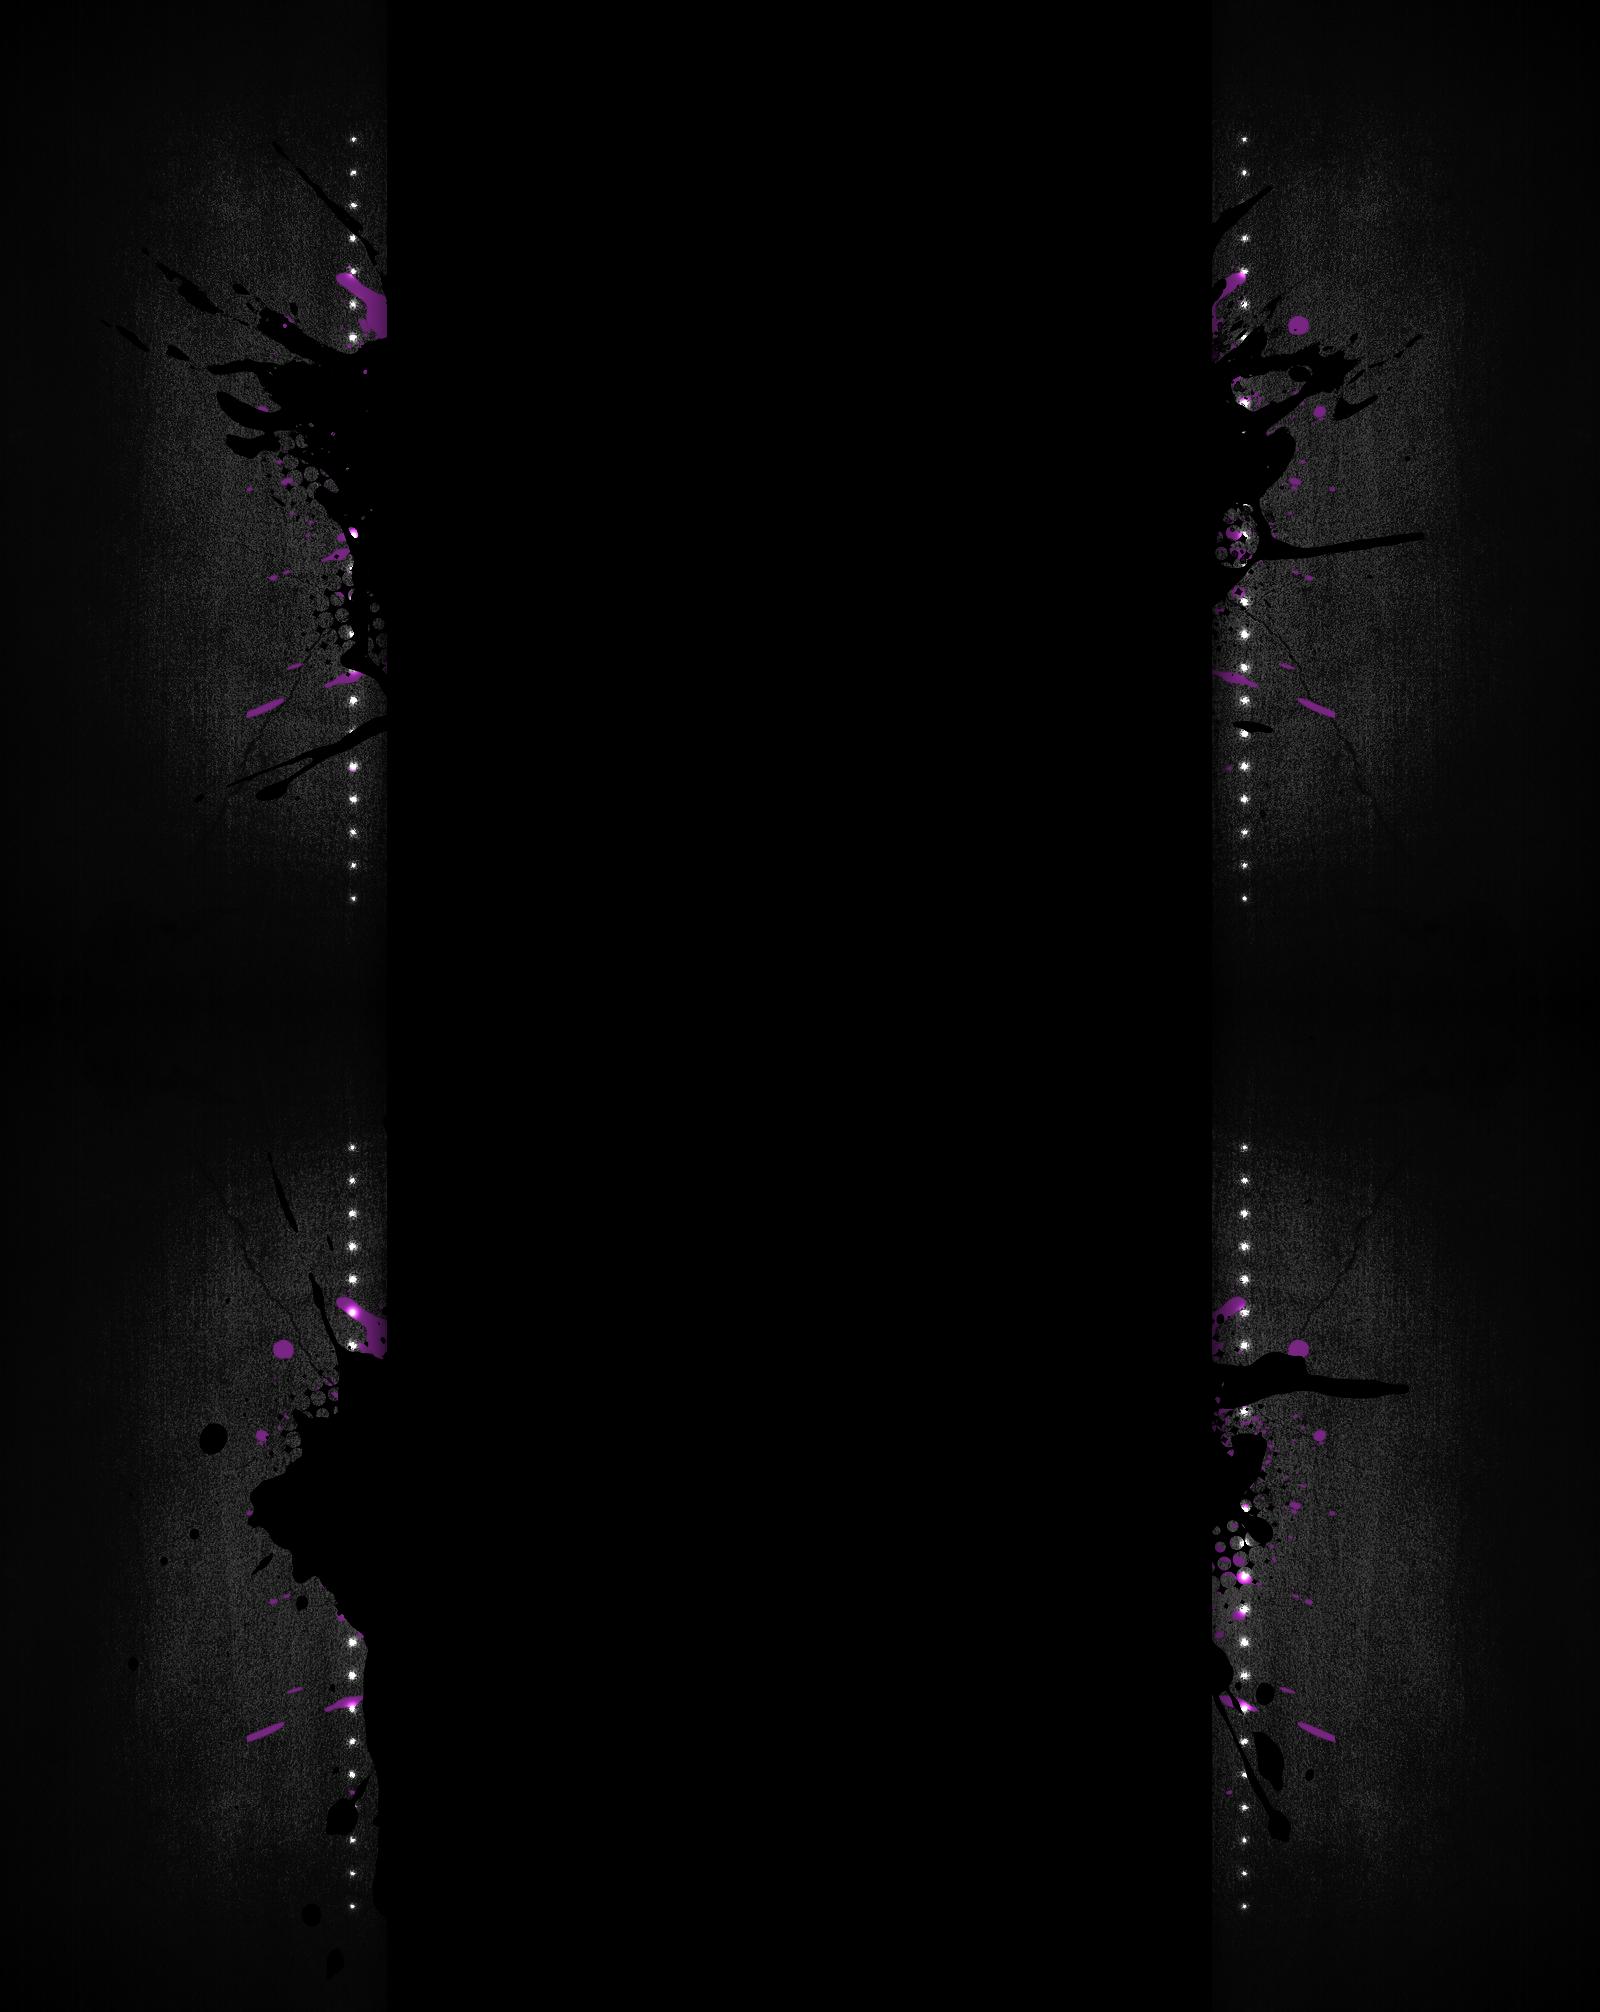 Imvu Backgrounds - WallpaperSafari